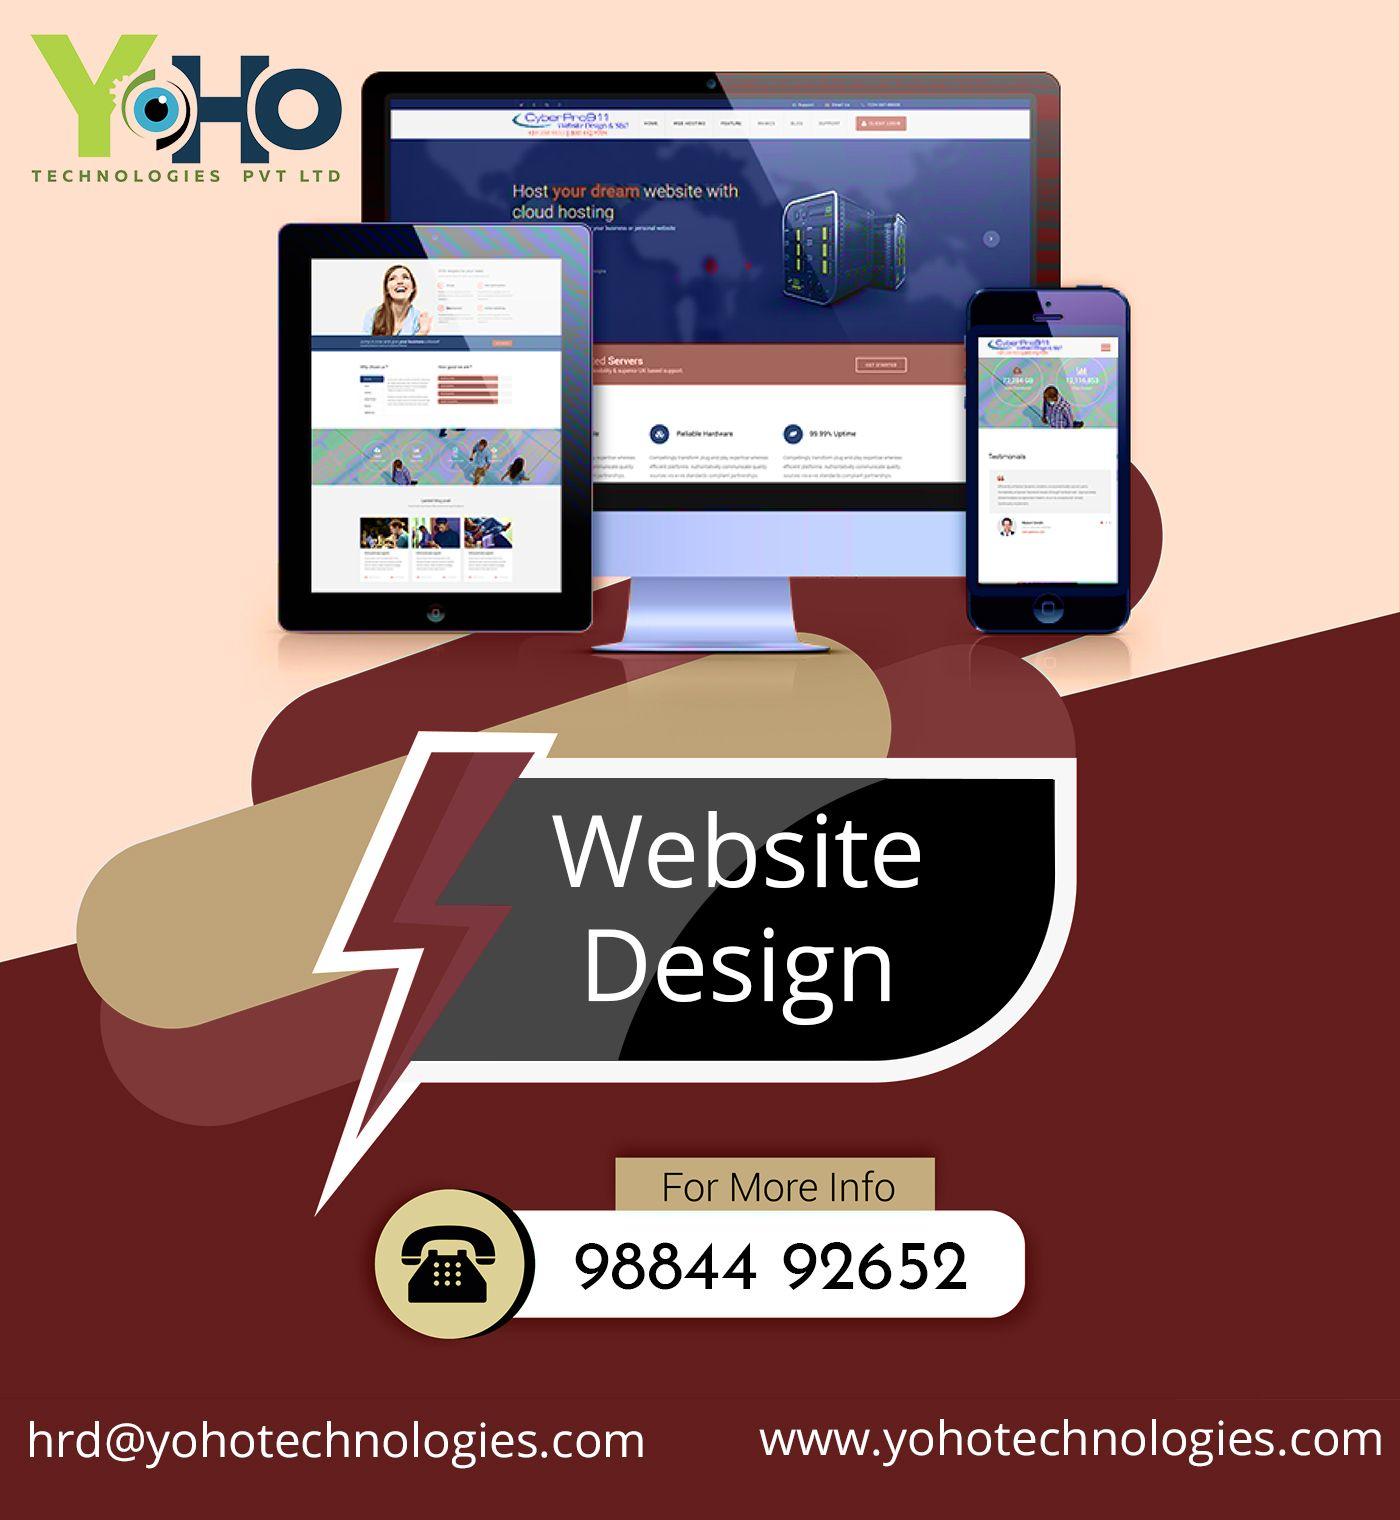 Website Design Company In Chennai In 2020 Website Design Company Website Design Web Design Company